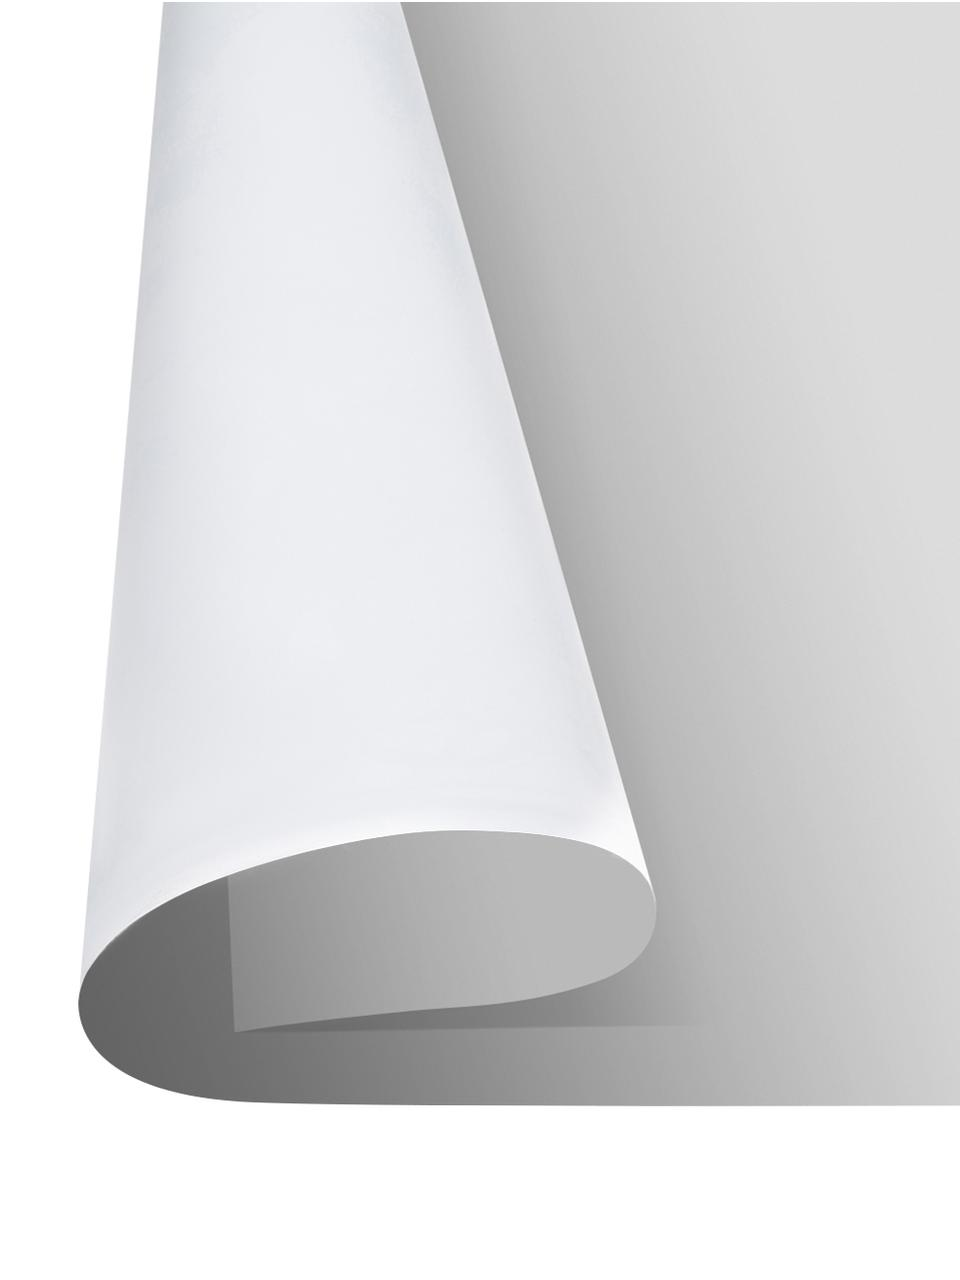 Flache Vinyl-Bodenmatte Aylin mit buntem Print, rutschfest, Vinyl, recycelbar, Mehrfarbig, 65 x 85 cm